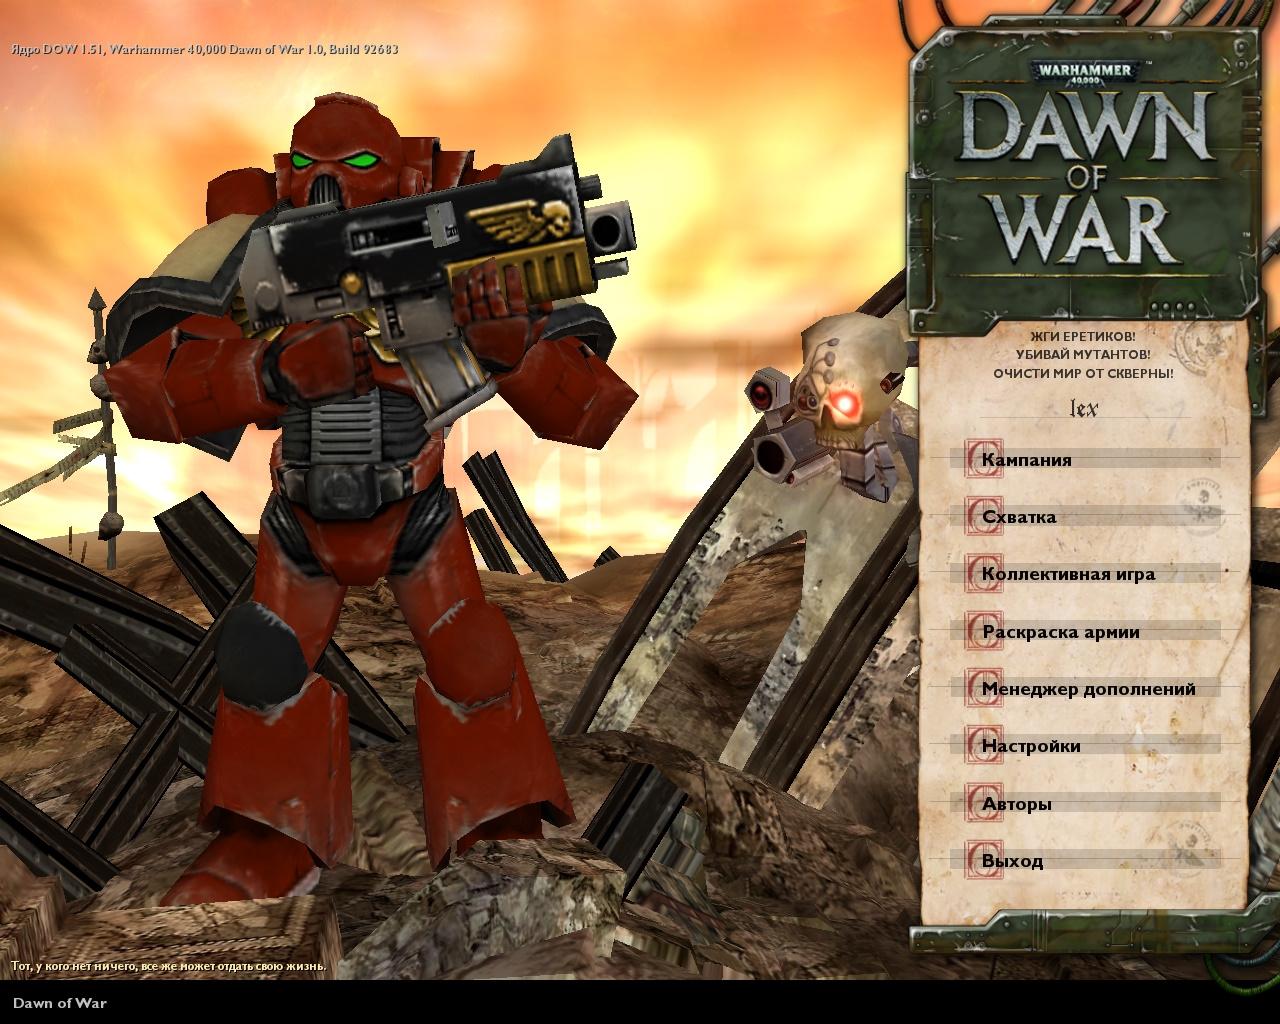 Warhammer 40,000: dawn of war ii gold there